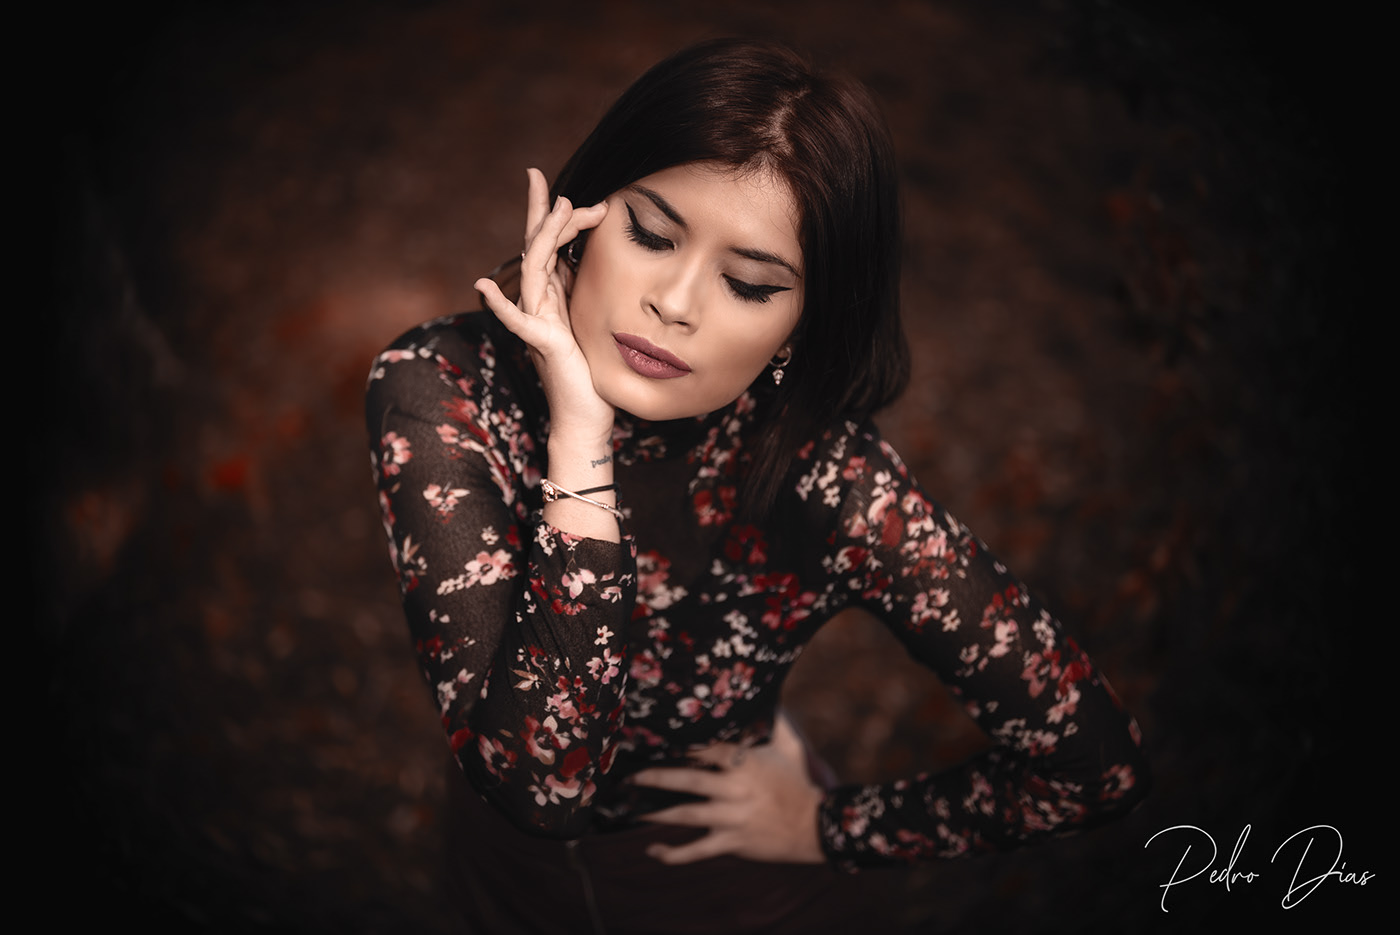 portrait photography woman sleep by pedro dias